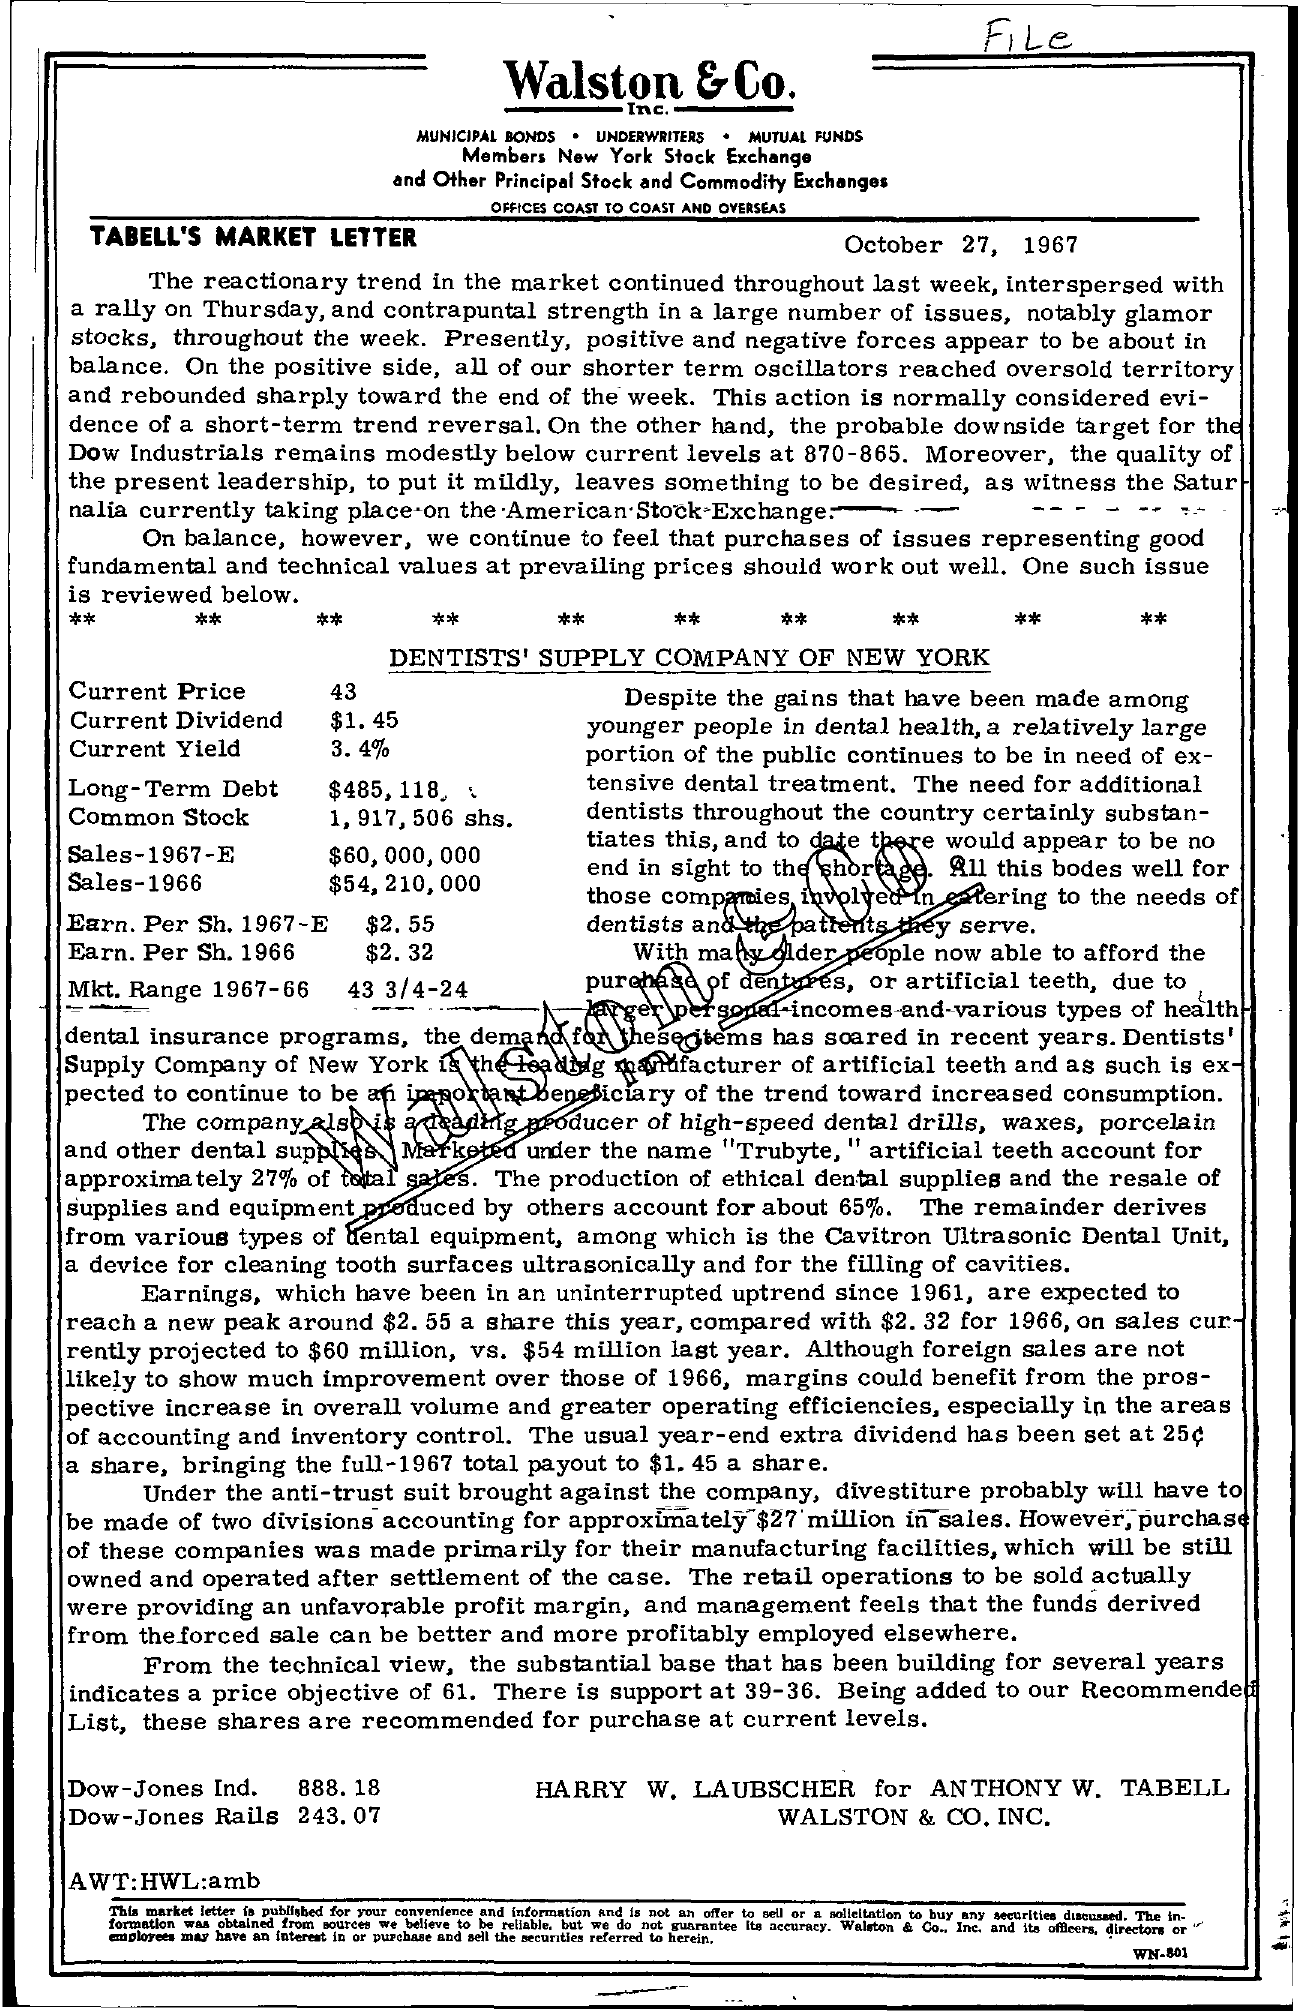 Tabell's Market Letter - October 27, 1967